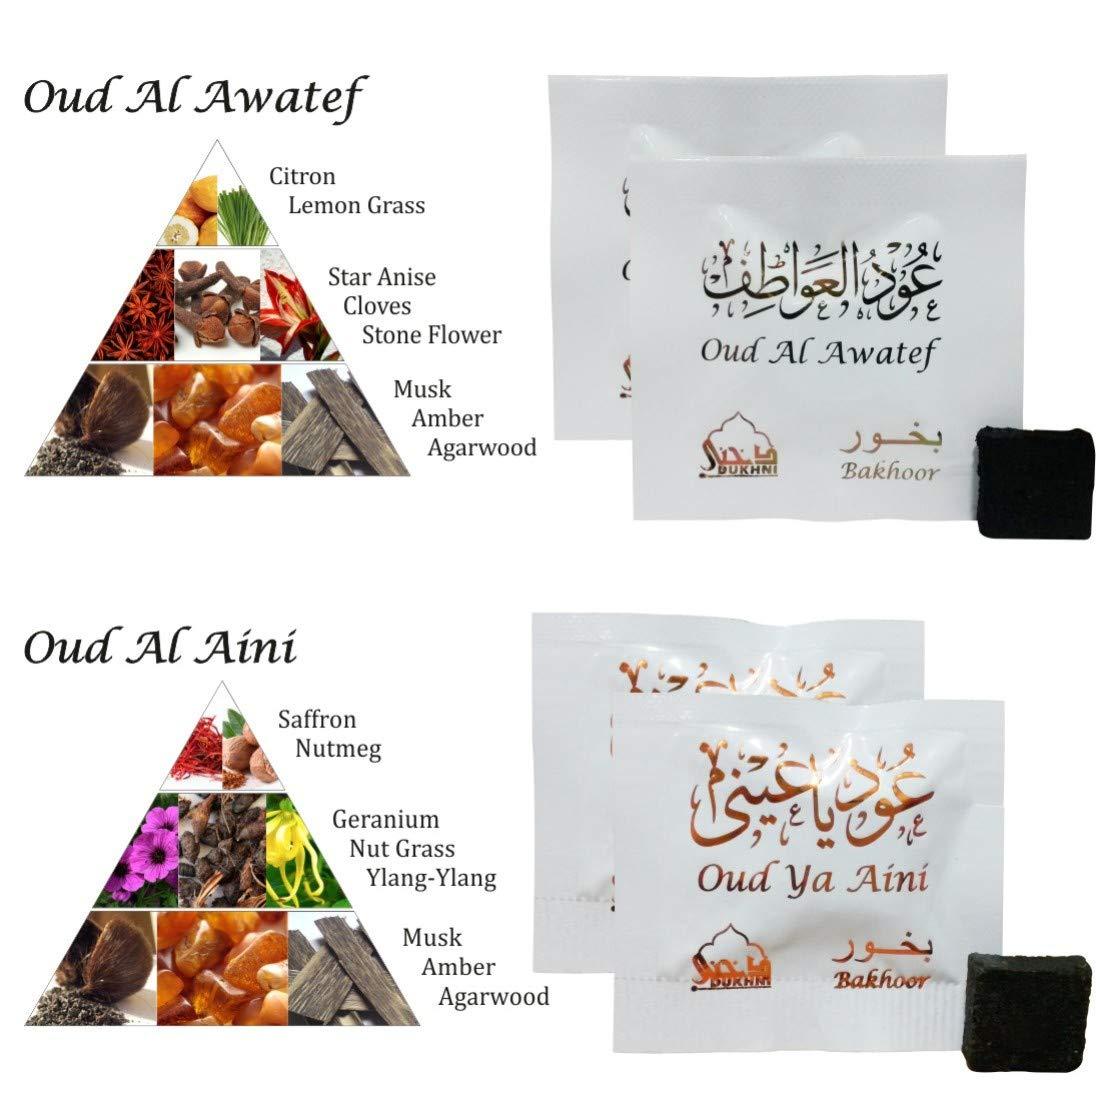 Dukhni Oud Bakhoor Incense Variety Box & Rainbow Bakhoor Burner - Gift Set & Starter Kit by Dukhni (Image #7)